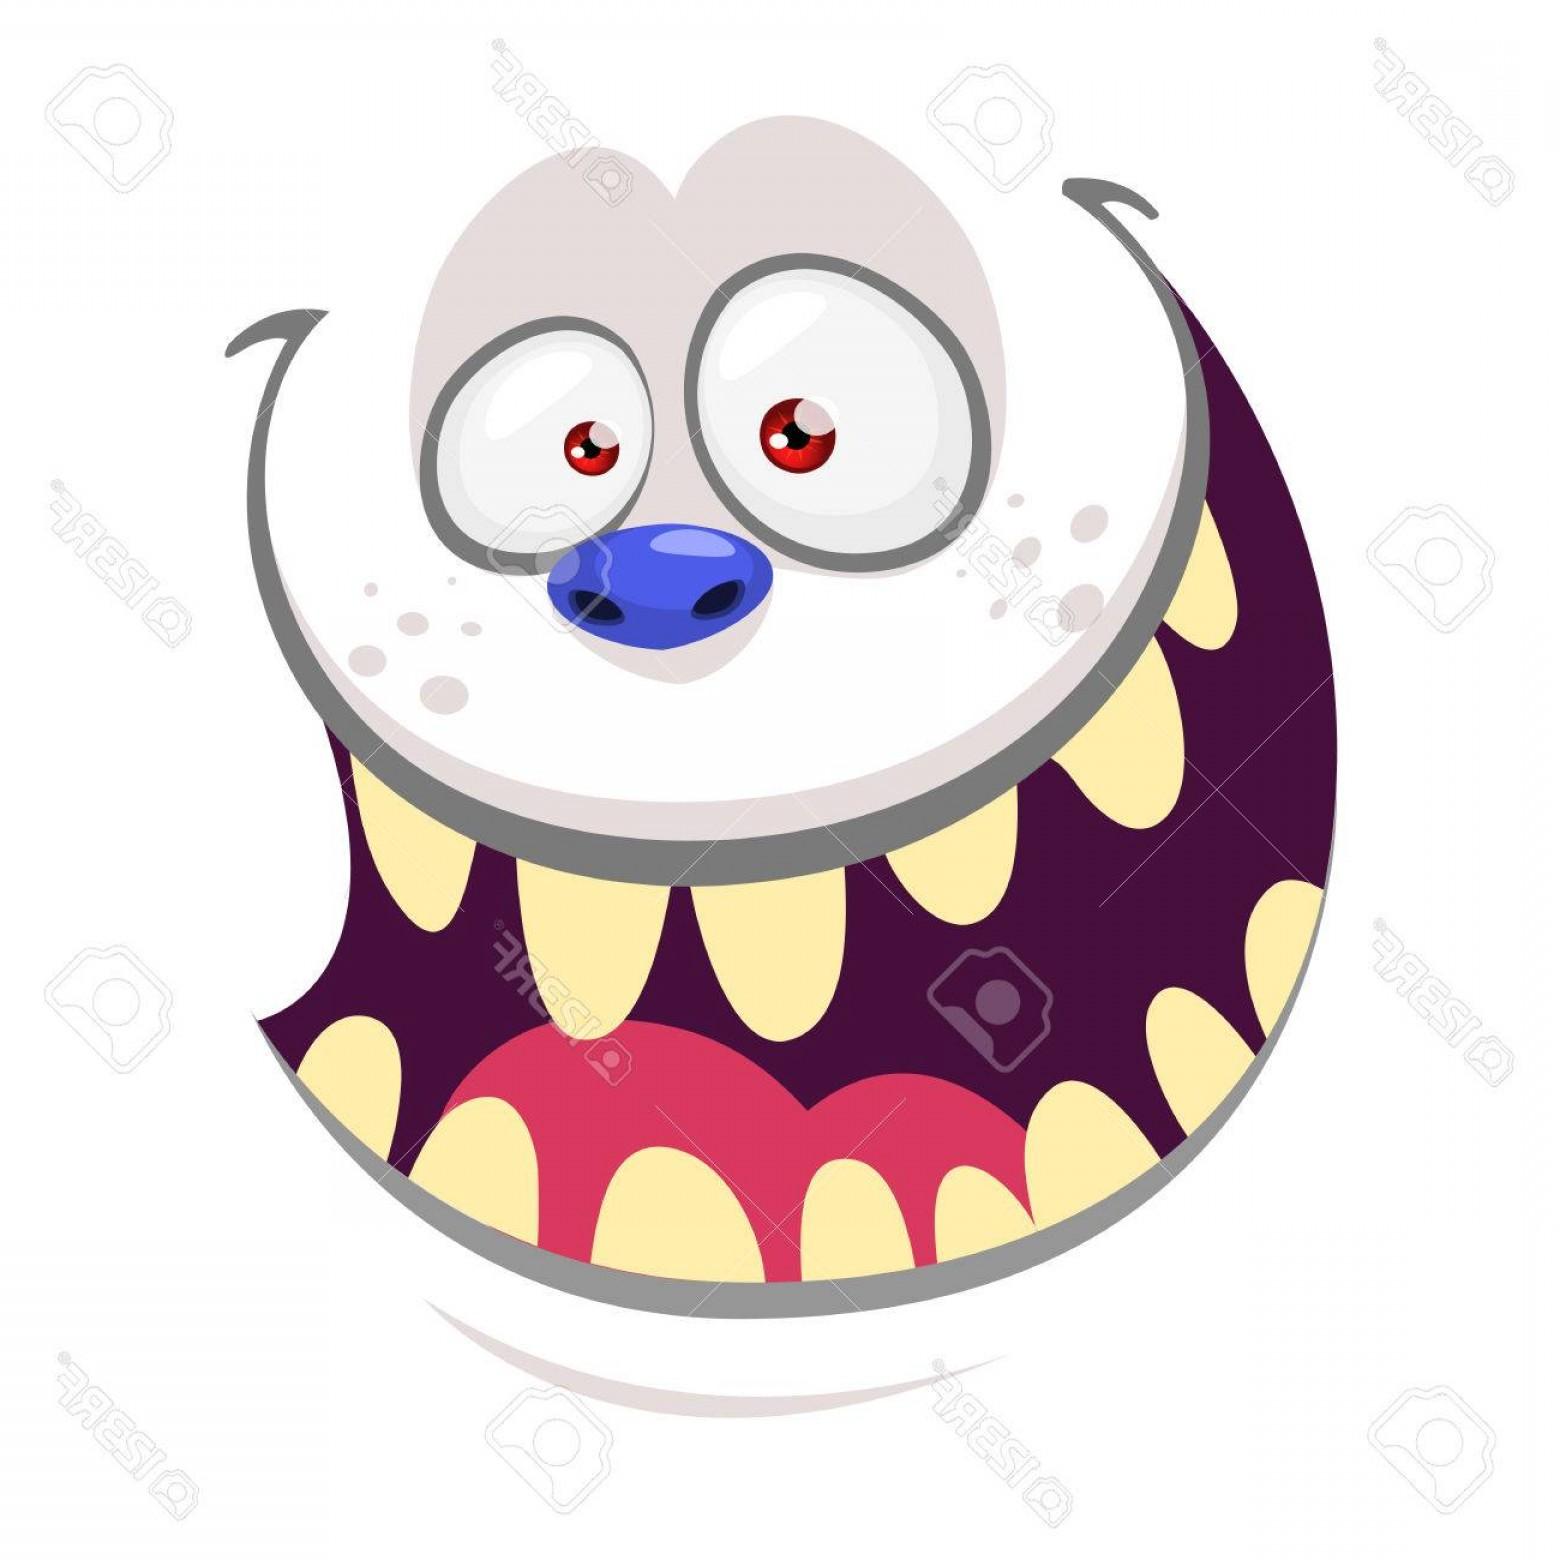 1560x1560 Photostock Vector Cartoon Monster Yeti Face Isolated On White